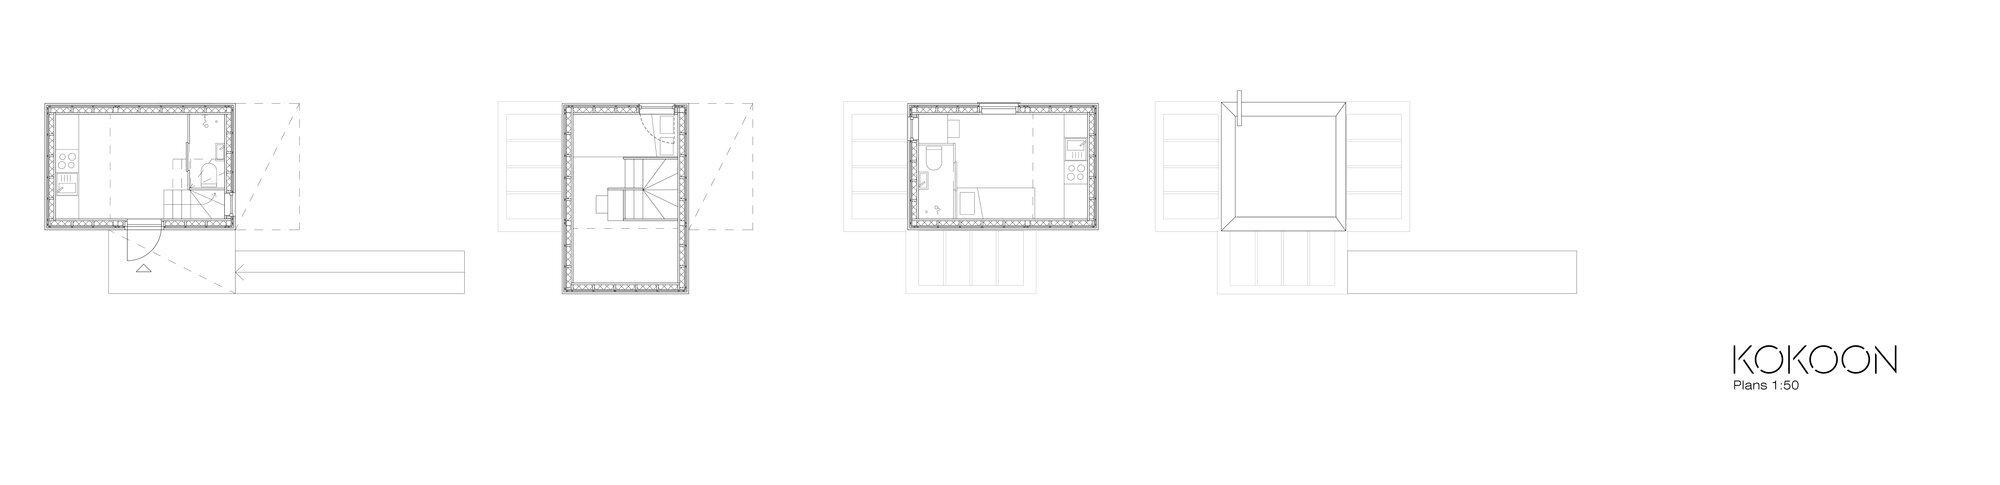 Kokoon - Aalto University Wood Program - Finland - Floor Plans - Humble Homes